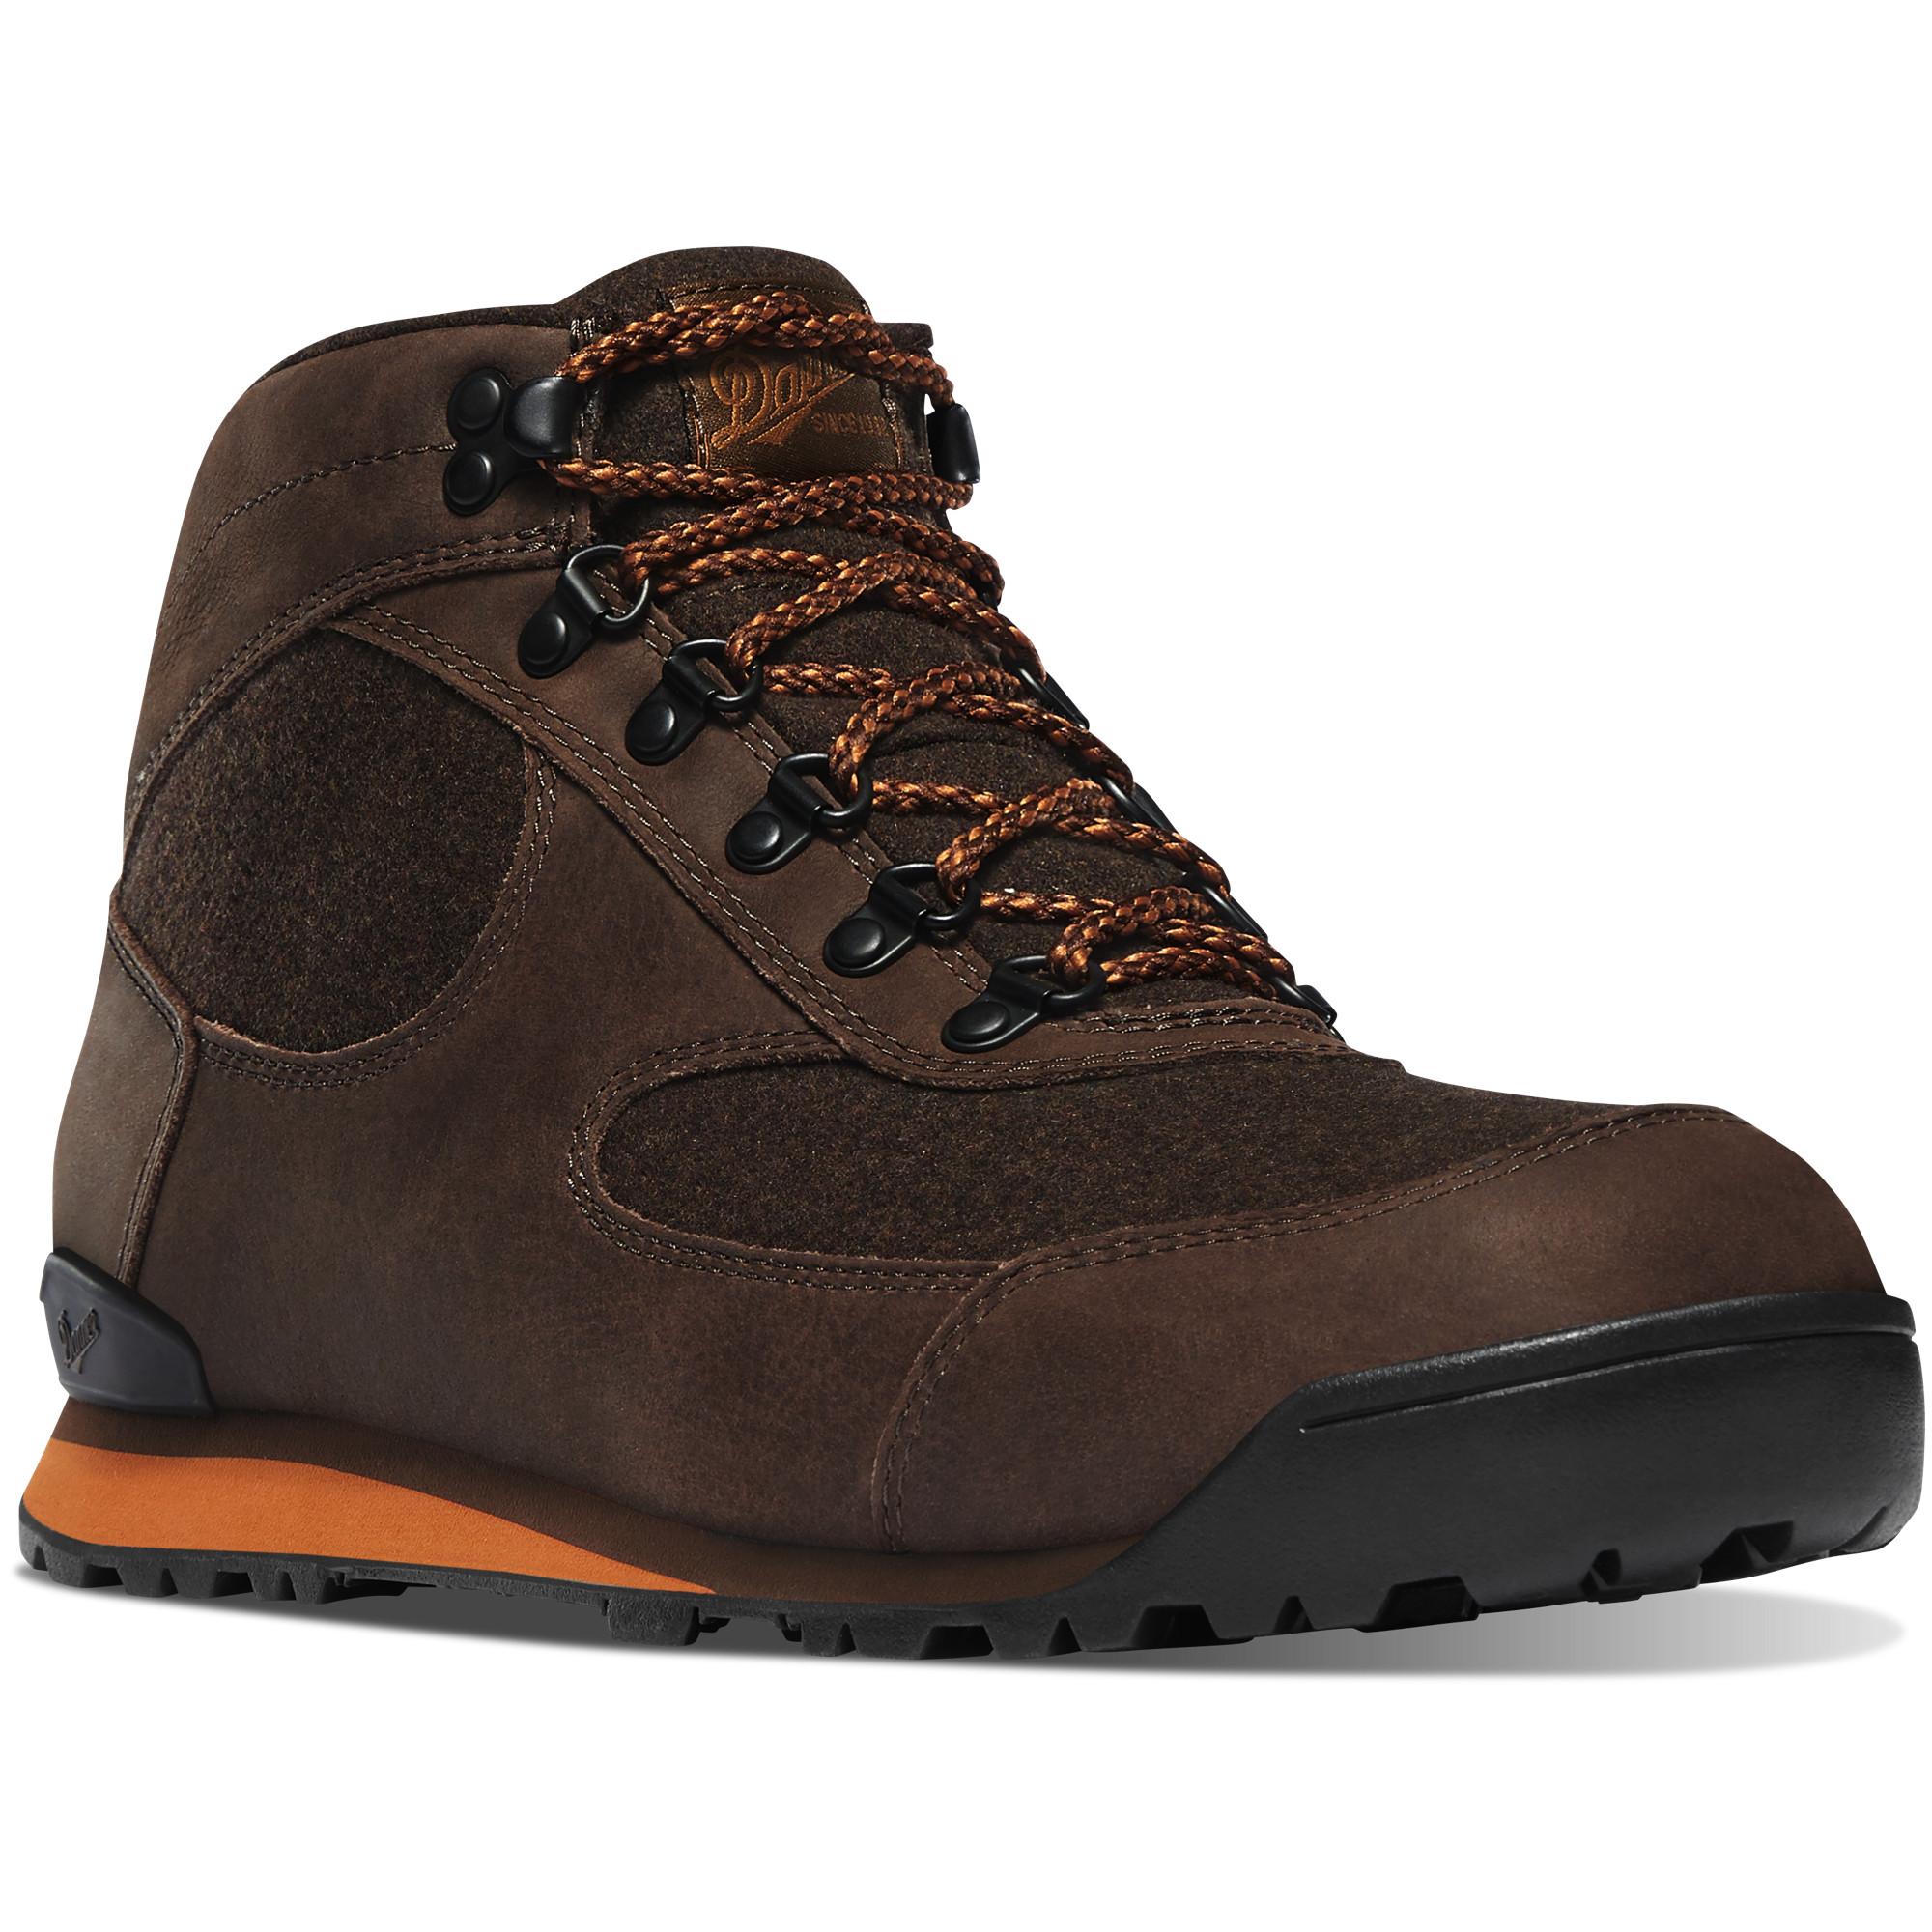 Danner: SALE: 40% Off Select Hike + Lifestyle footwear